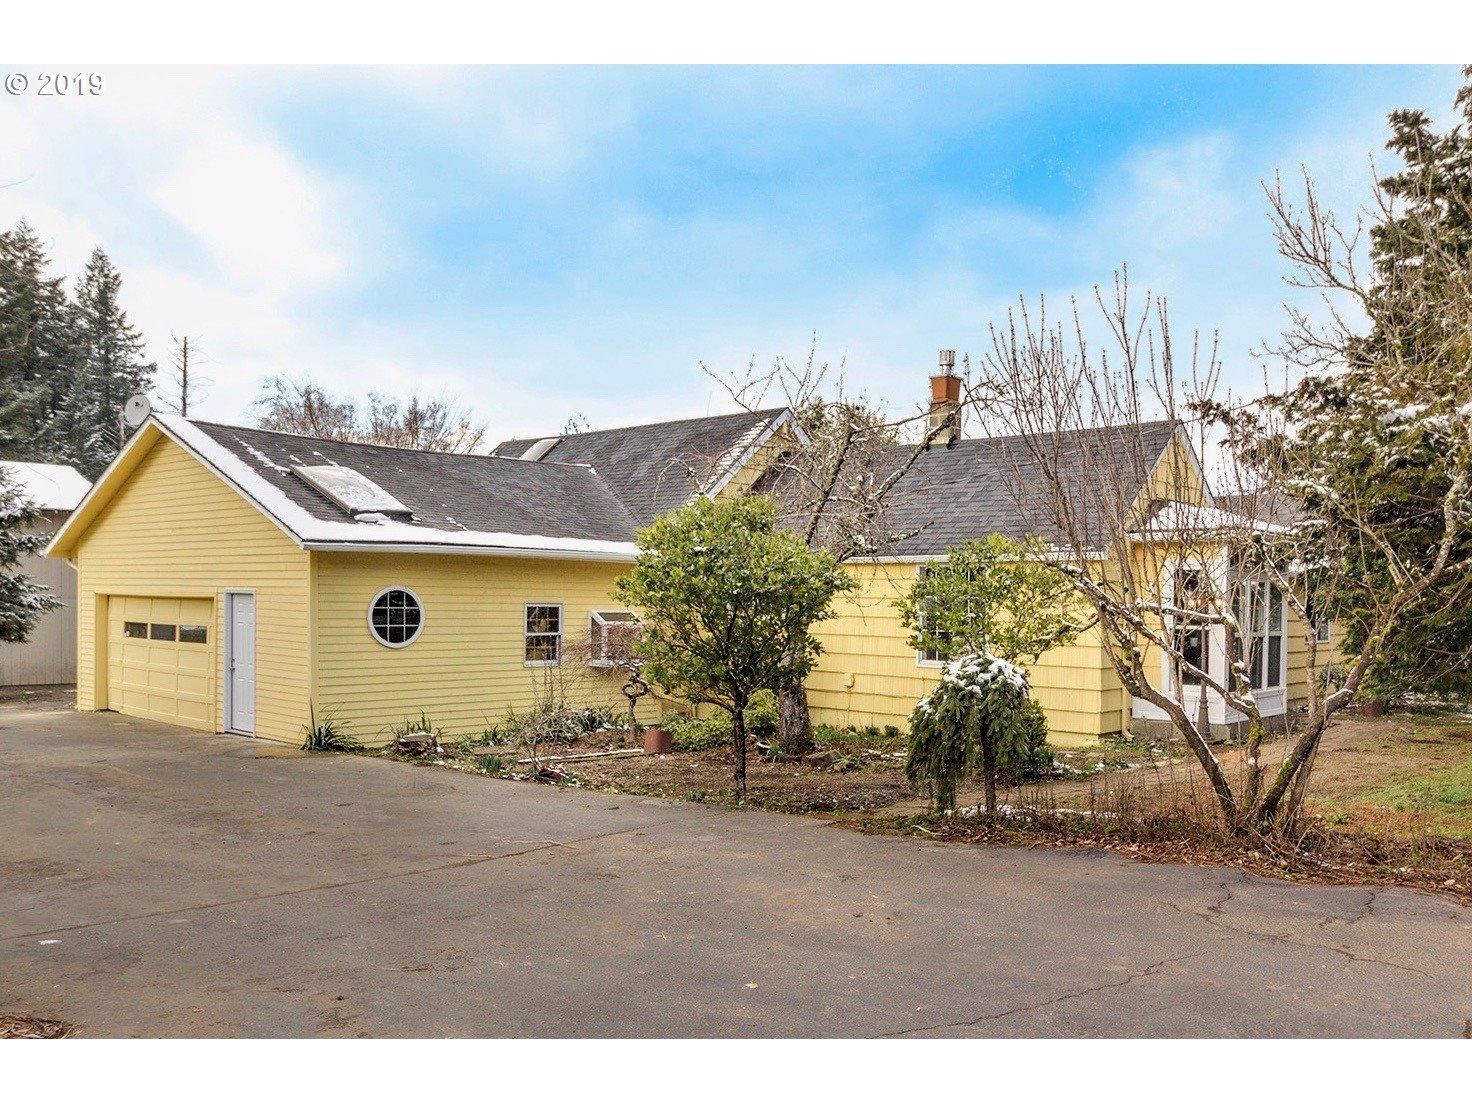 Photo of 20379 S FERGUSON RD Oregon City OR 97045